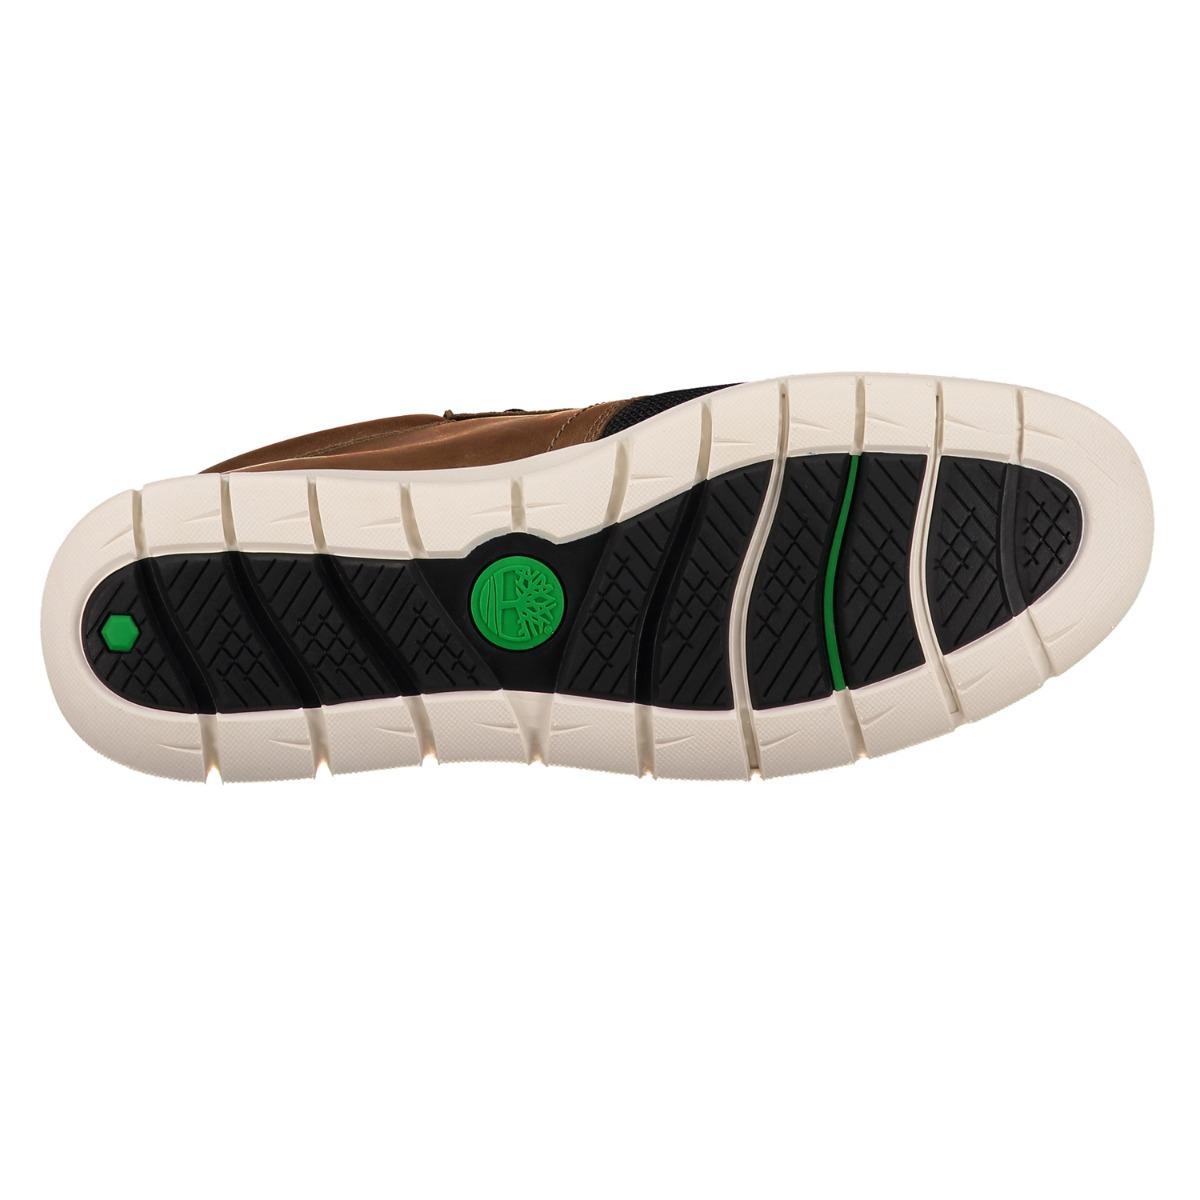 Zapato Piel Timberland A1ofy Hombre Café